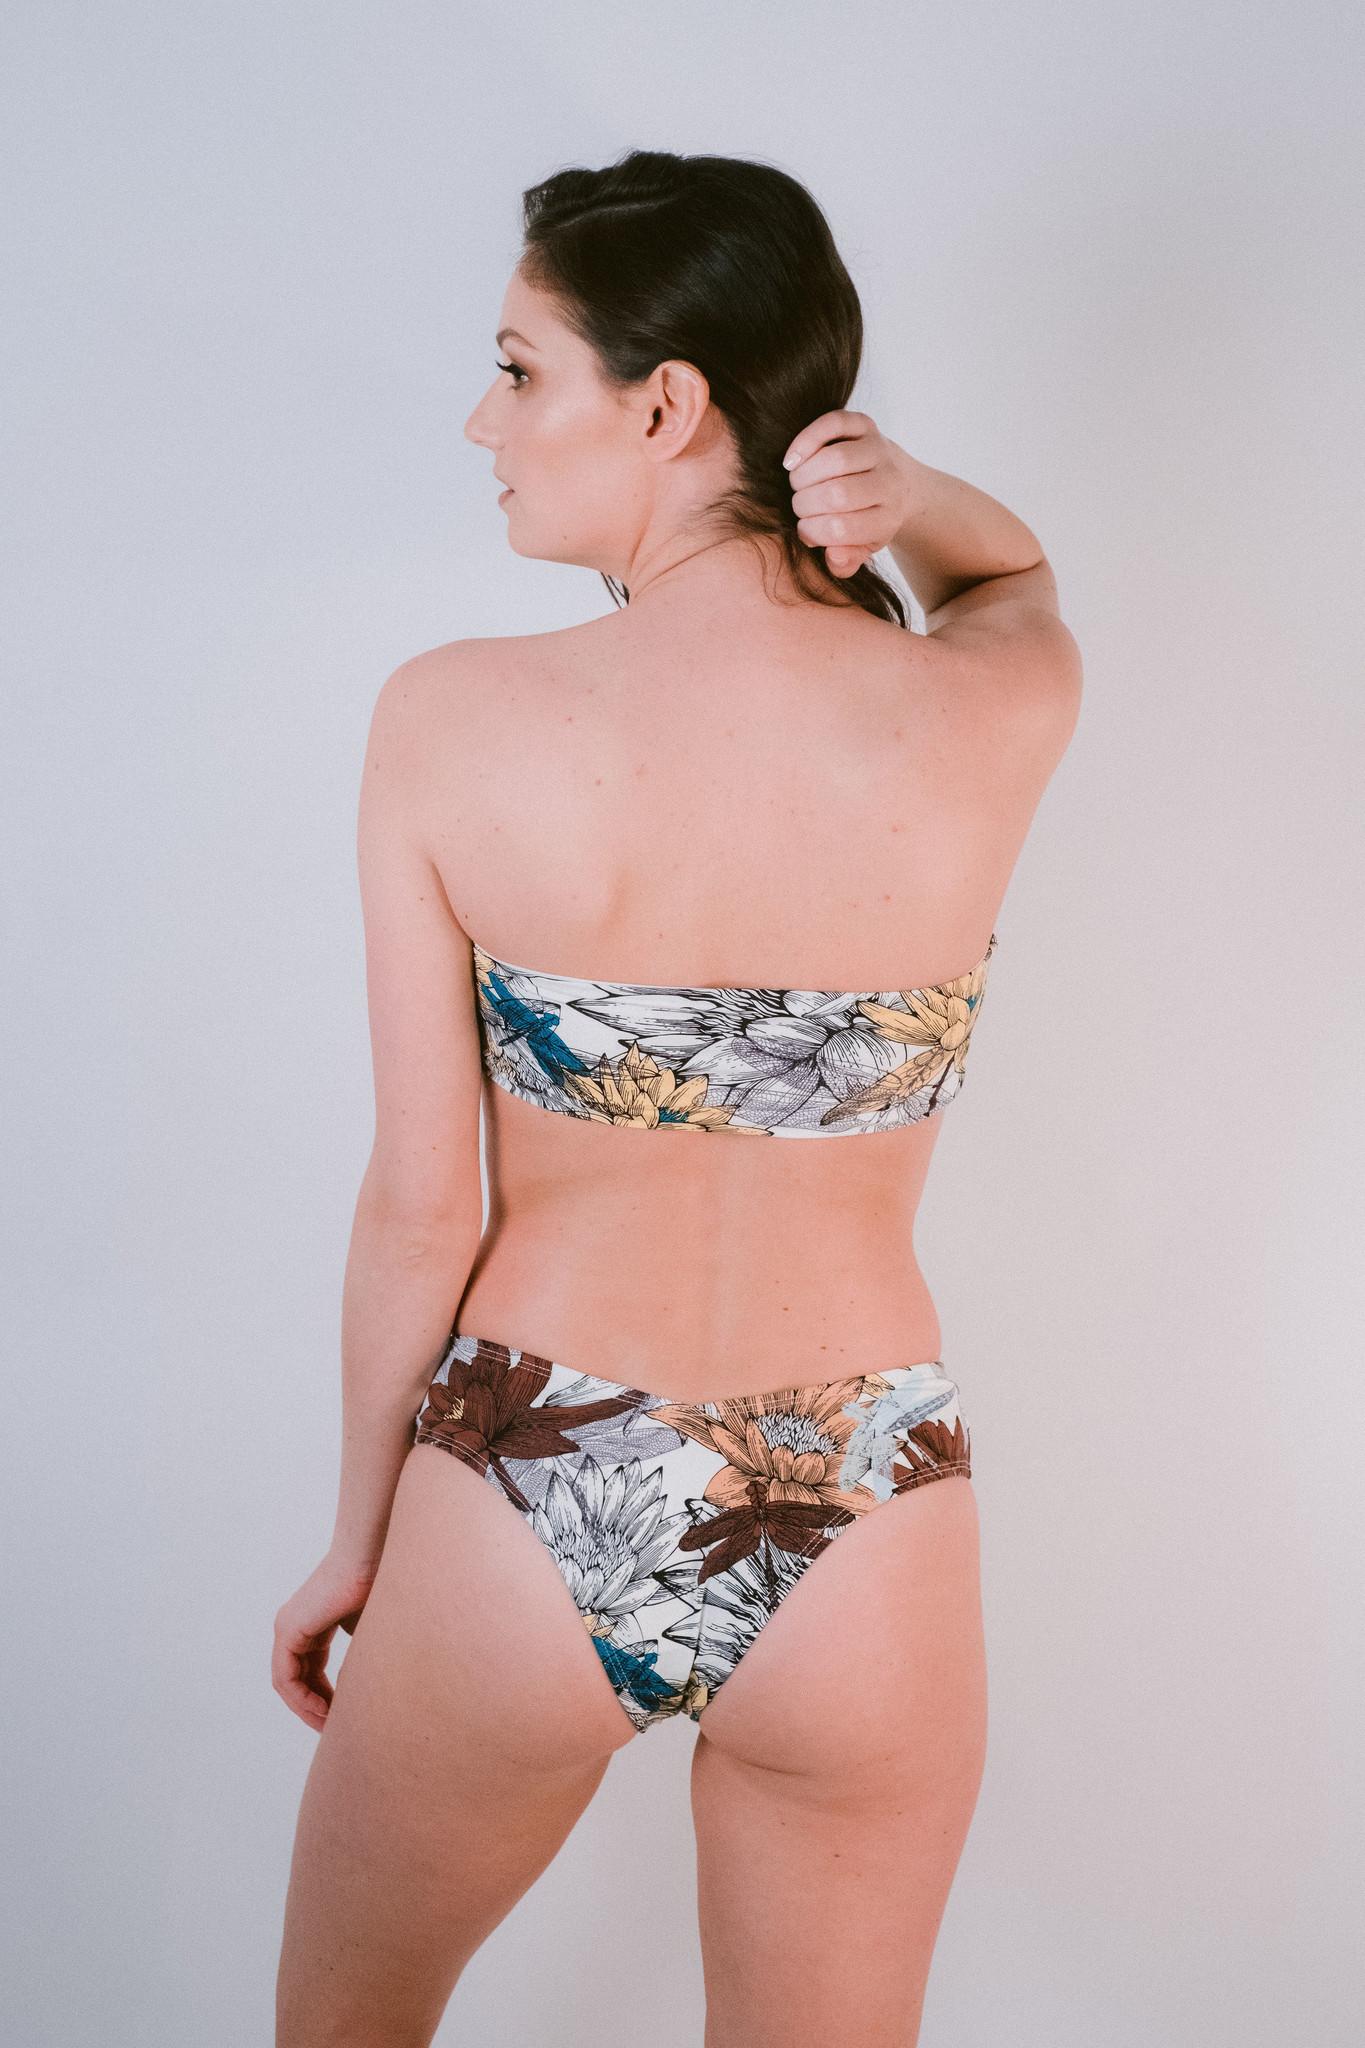 27d6e816109 Lotus Bandeau Bikini Top - Bobbles and Lace